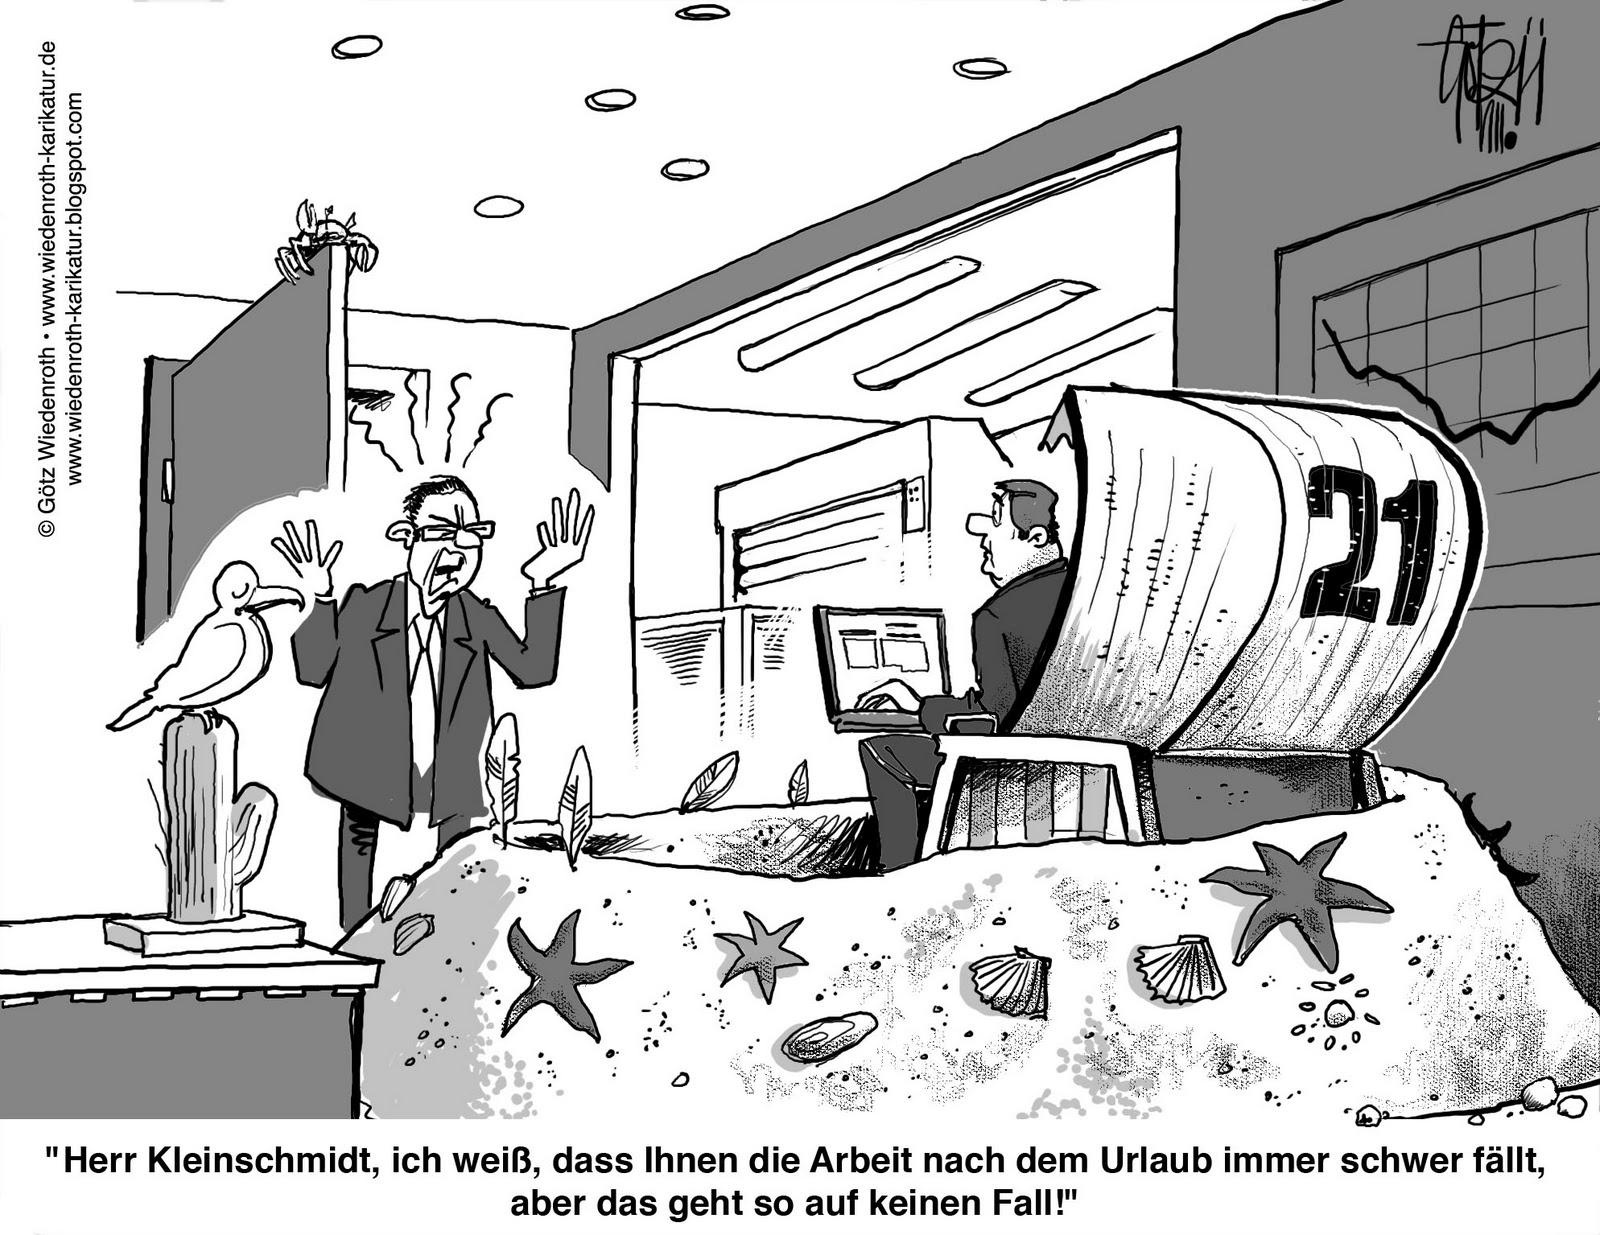 Strandkorb comic  Krankheitsbild Urlaubspsychose. | Karikamur-Karikatur! - Wiedenroth